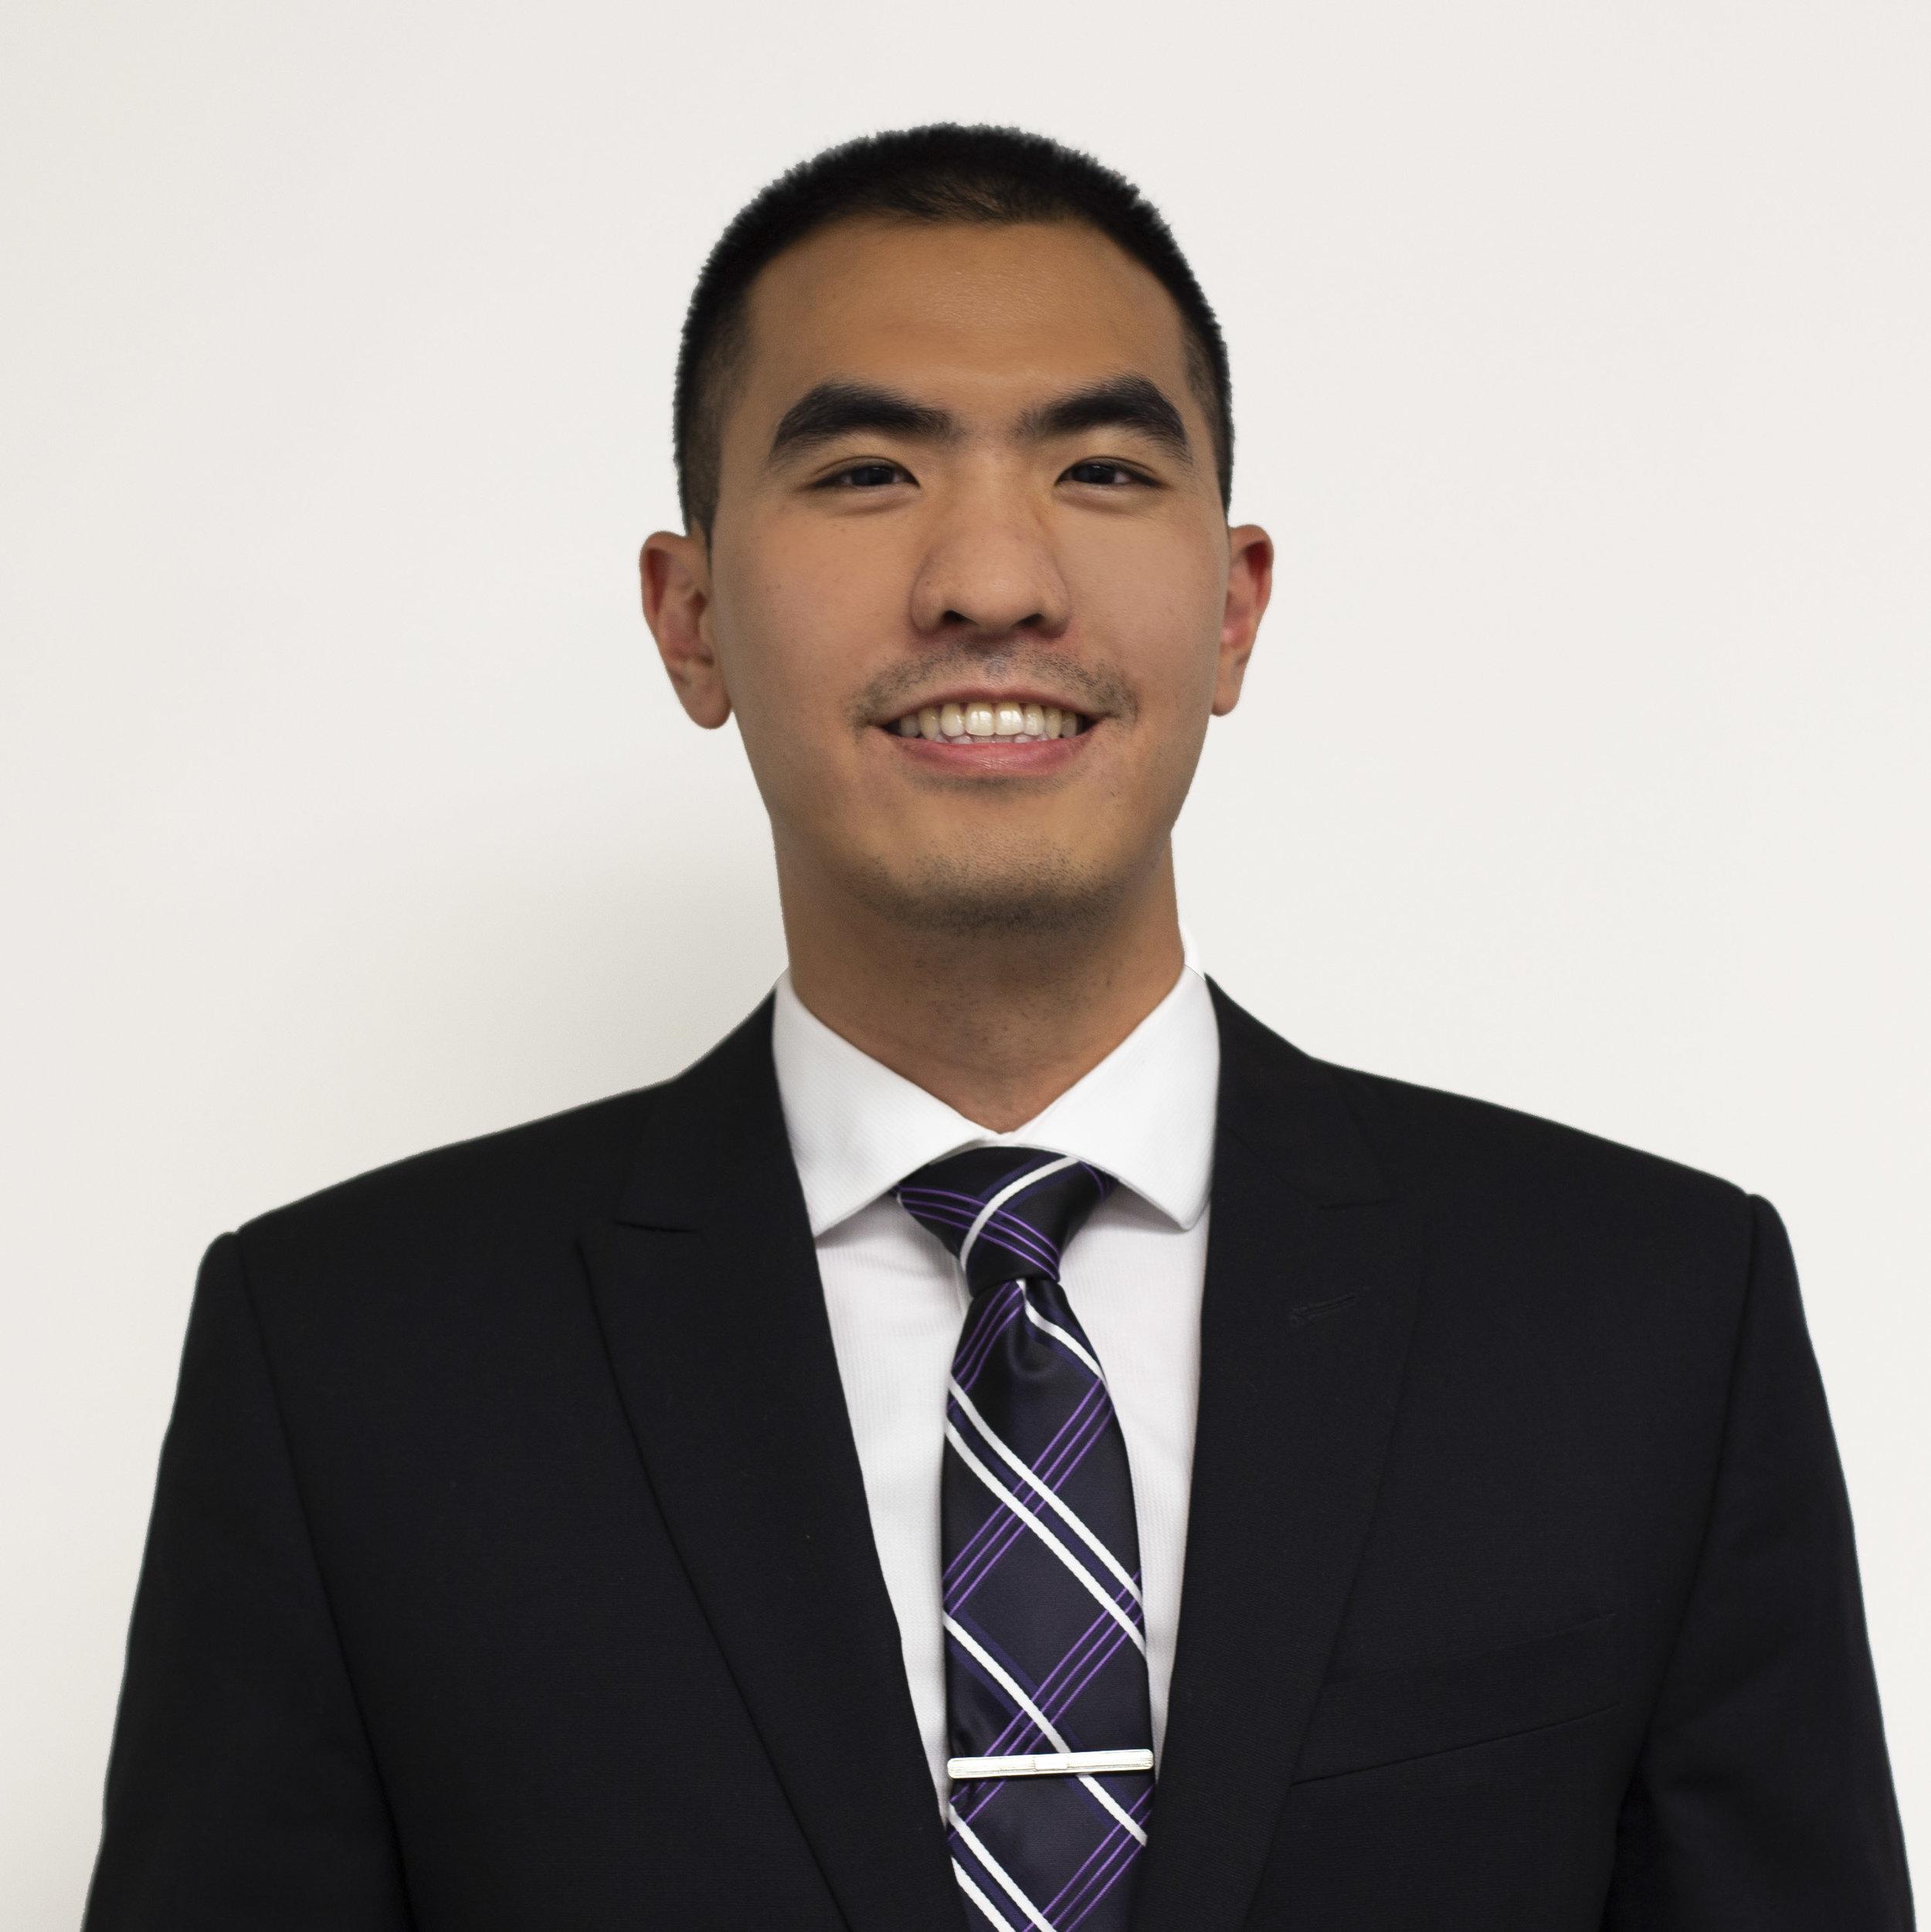 Jason Lee Panoptic Development